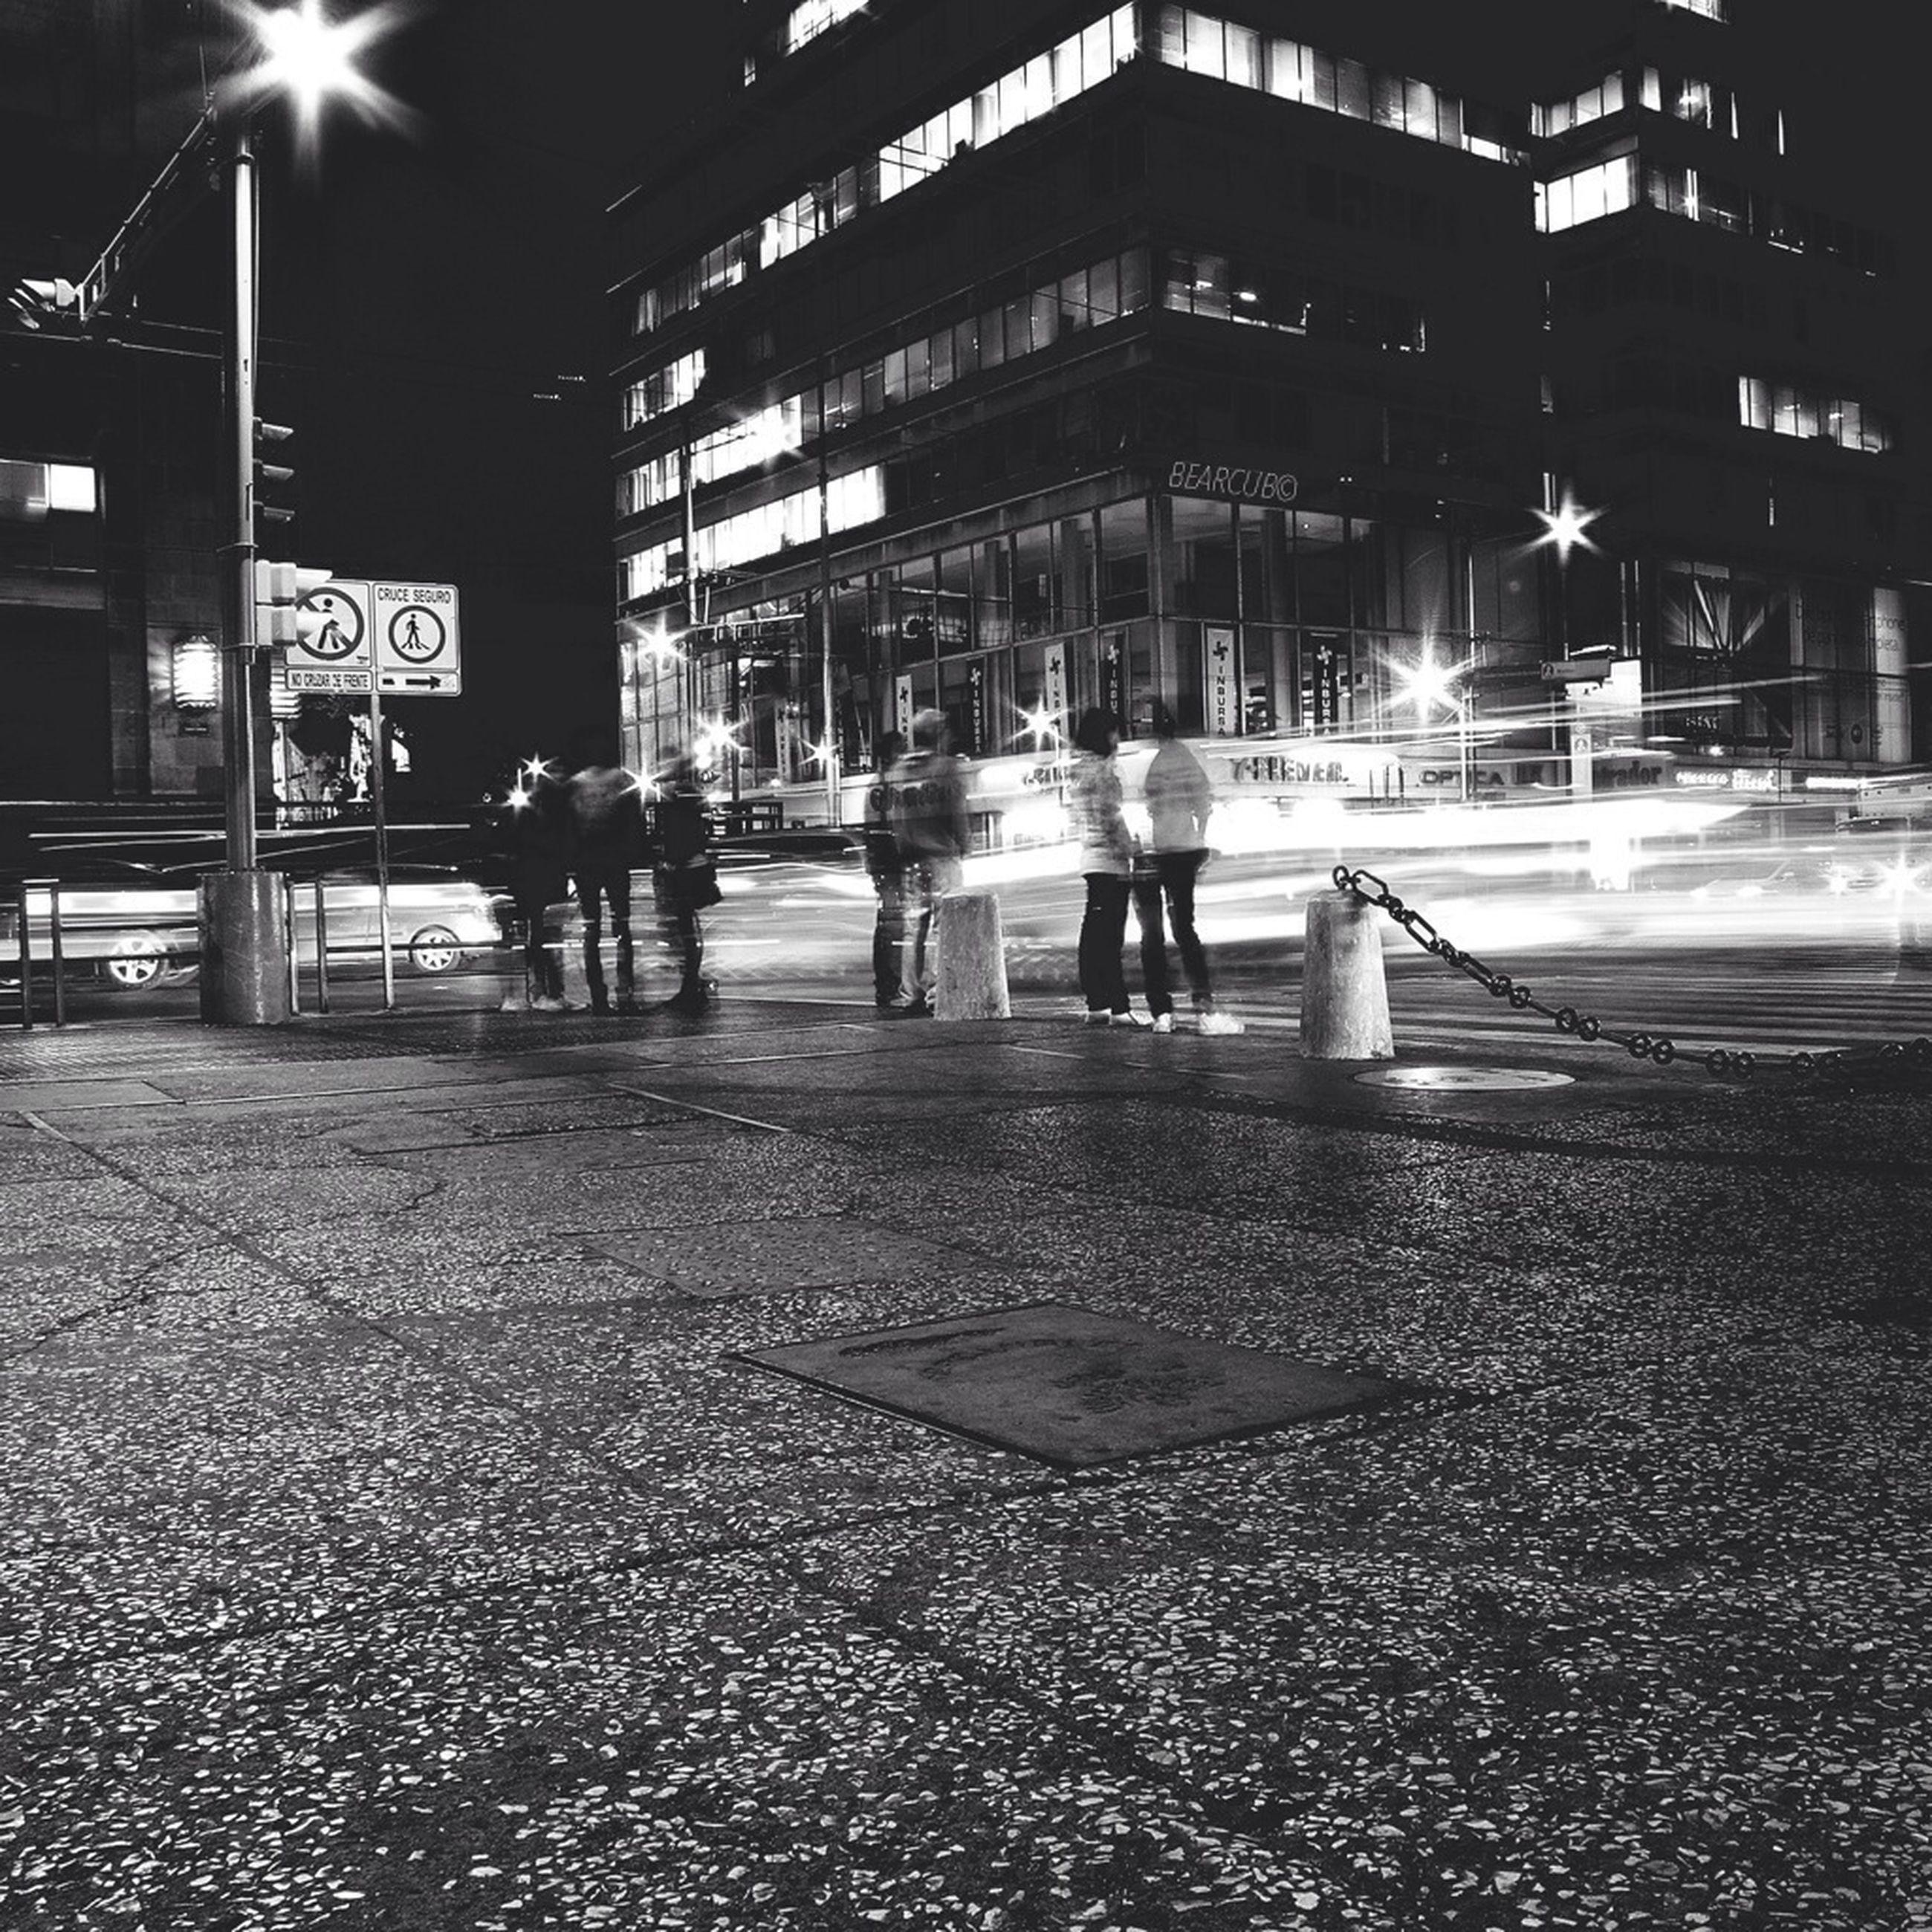 building exterior, night, city, street, illuminated, architecture, built structure, city life, men, walking, city street, lifestyles, road, transportation, street light, person, outdoors, leisure activity, text